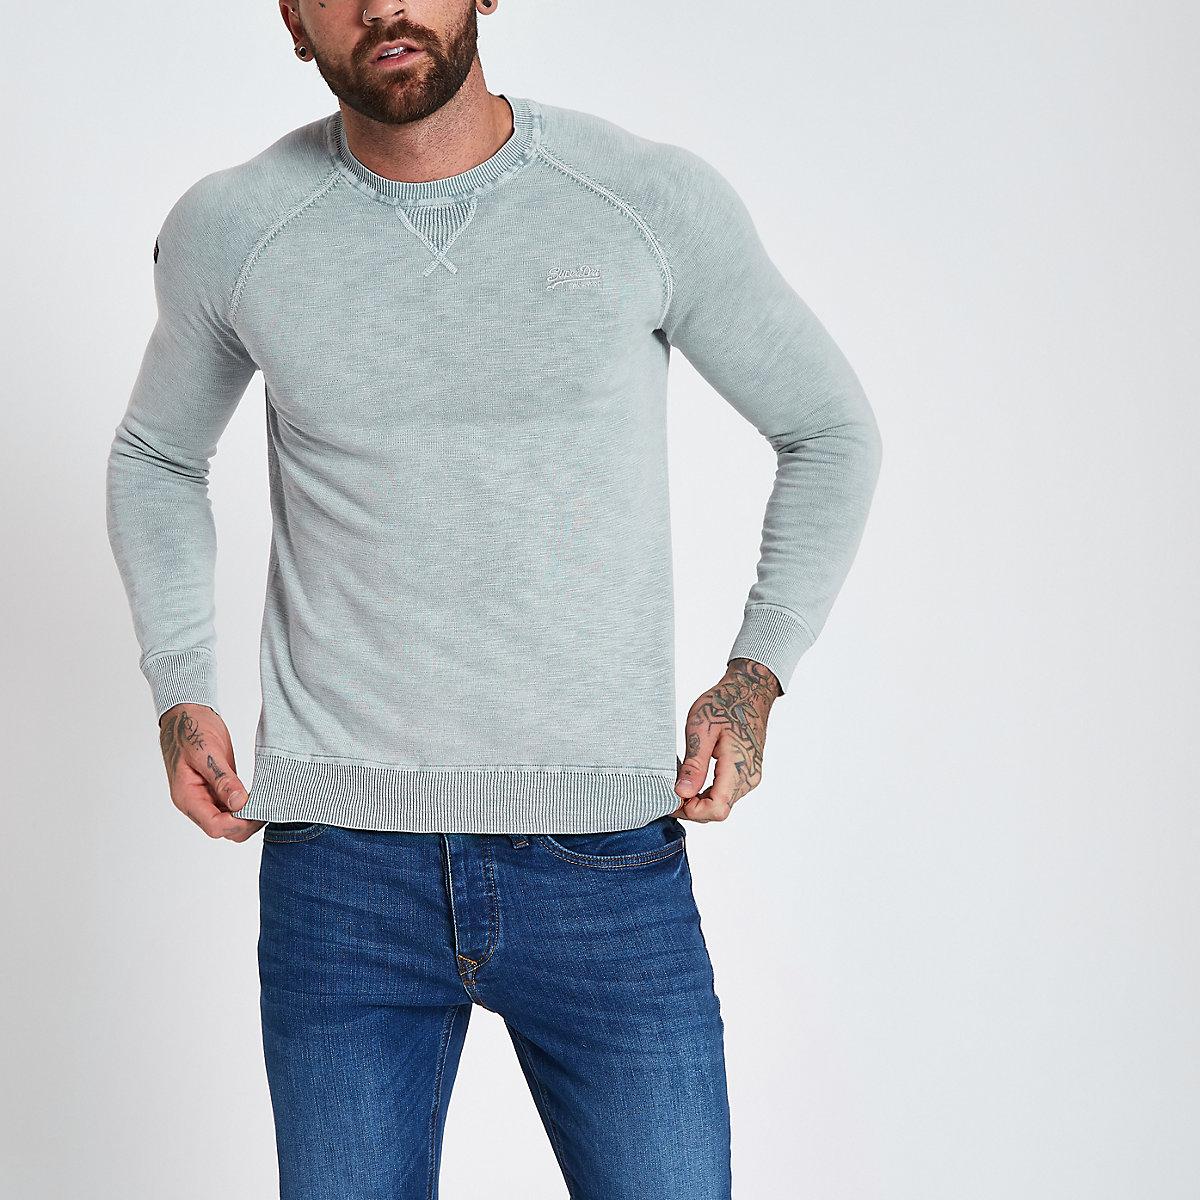 Superdry grey jumper